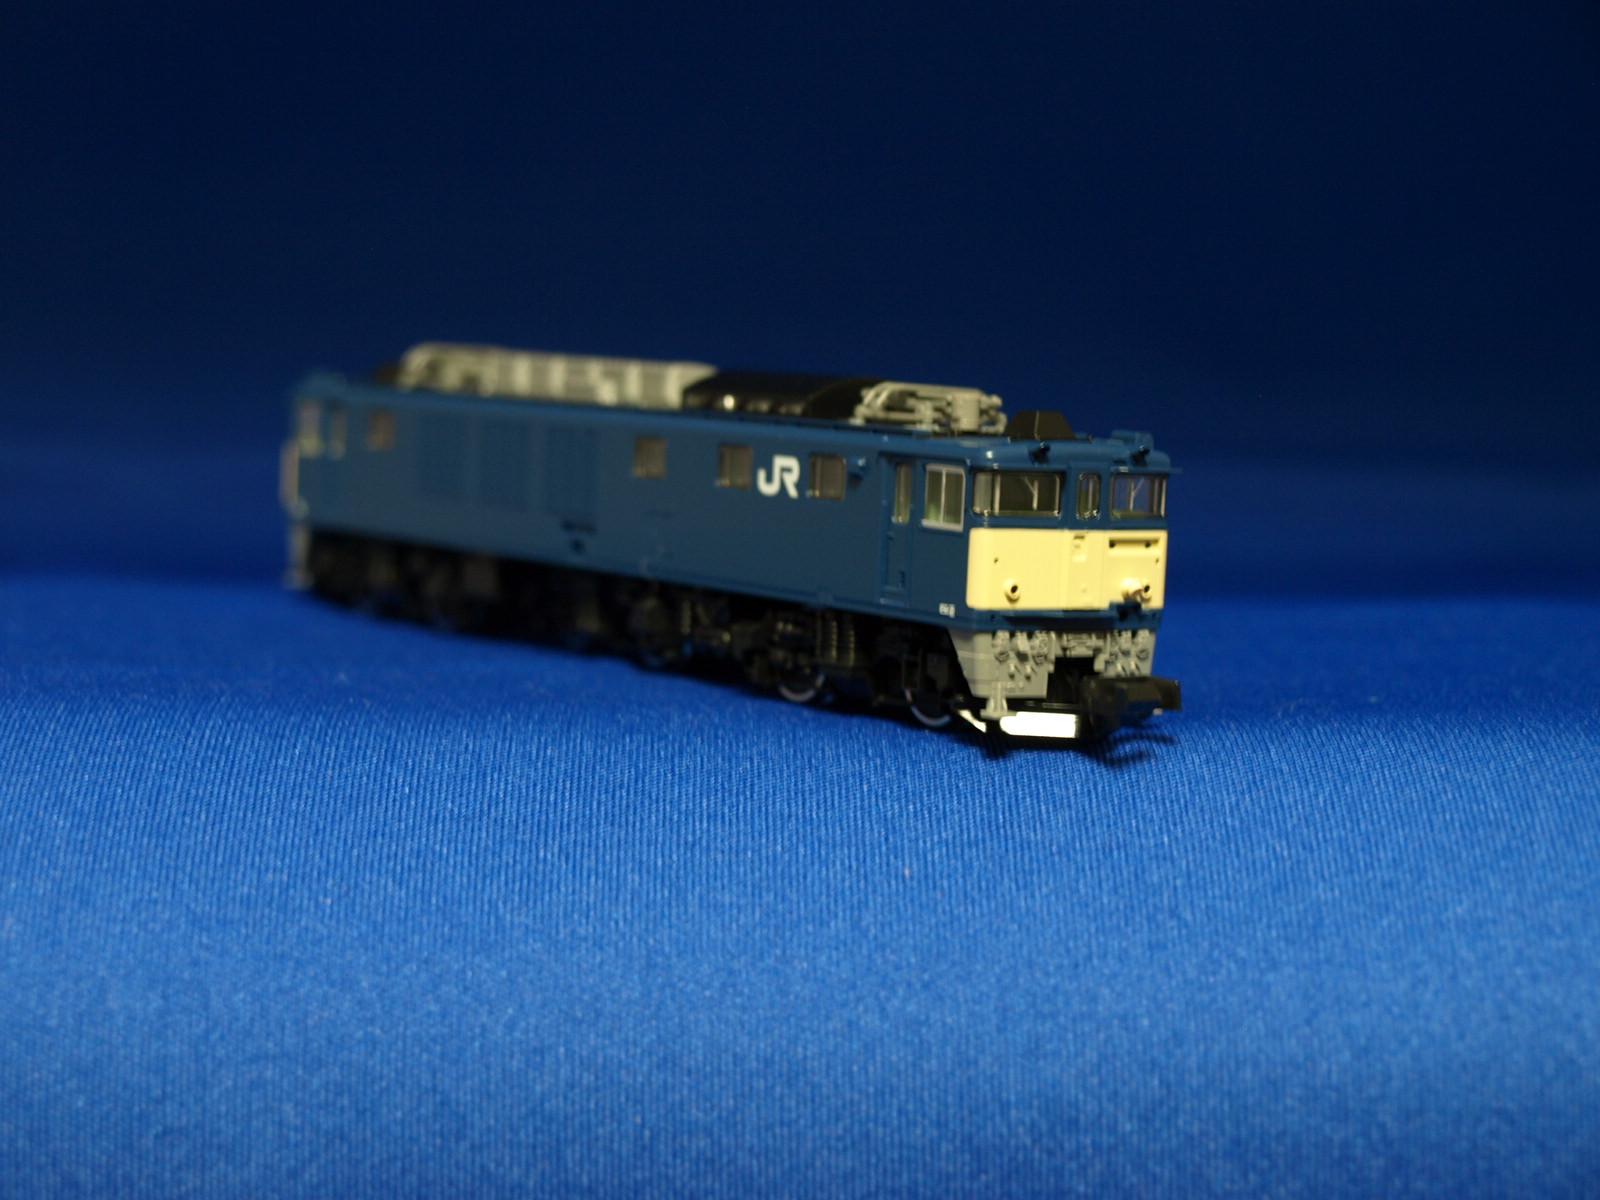 Nゲージ トミックス 9148 JR EF64-1000形電気機関車(1030号機・双頭形連結器付)